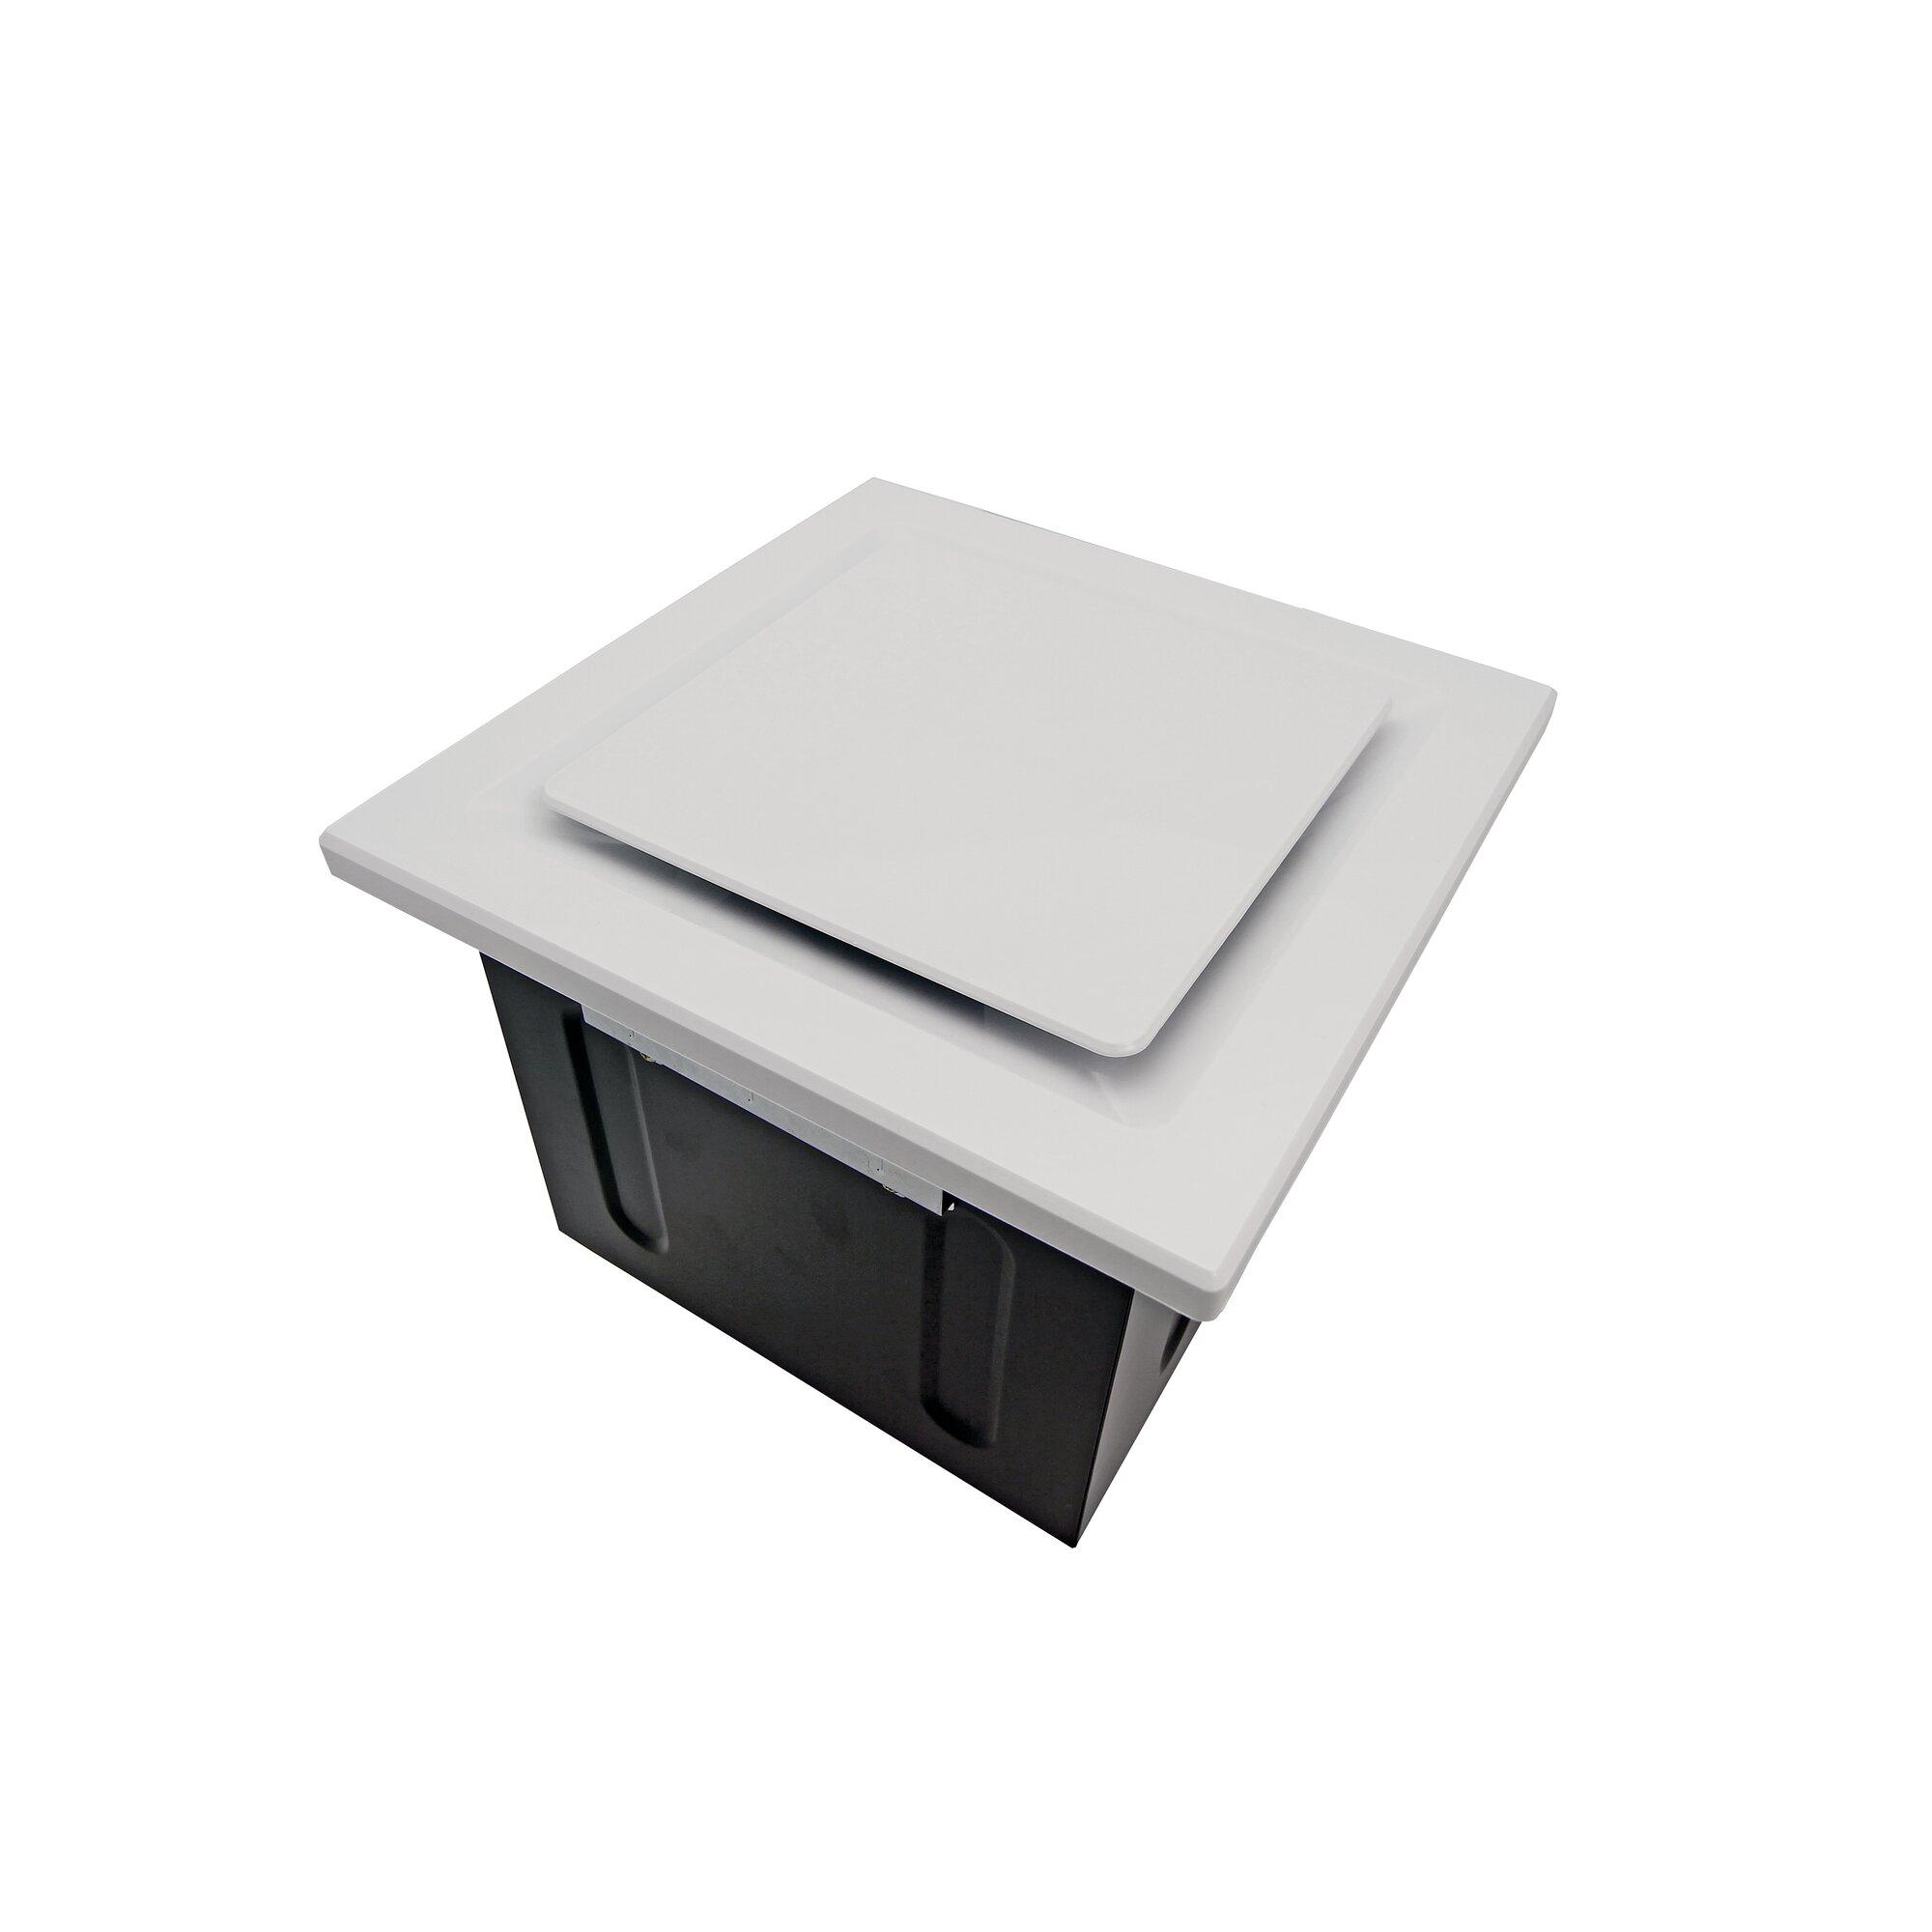 Emerson pryne bathroom exhaust fan - Super Quiet 80 Cfm Bathroom Ventilation Fan